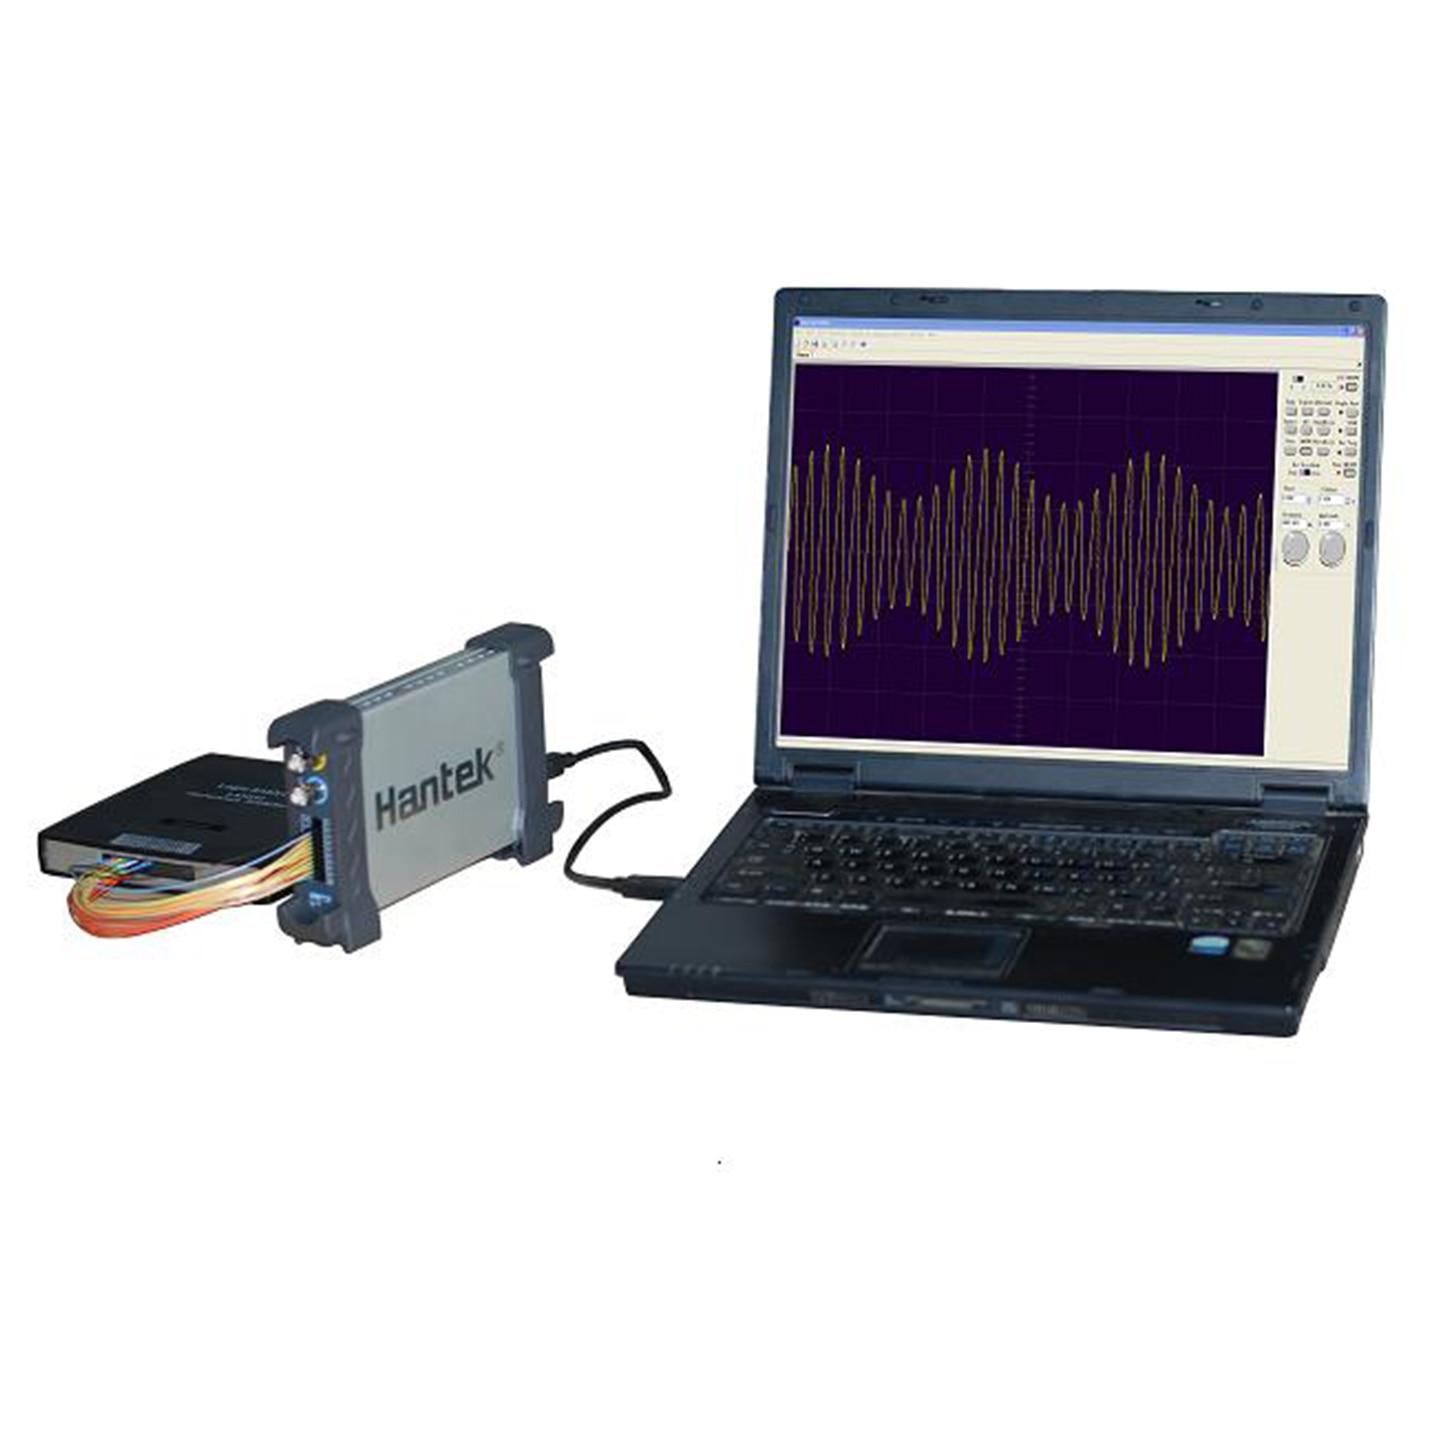 1025G PC USB funktion/arbitrary waveform generator Hantek 1025G 25MHz Arb. Welle 200MSa/s DDS USBXITM interface